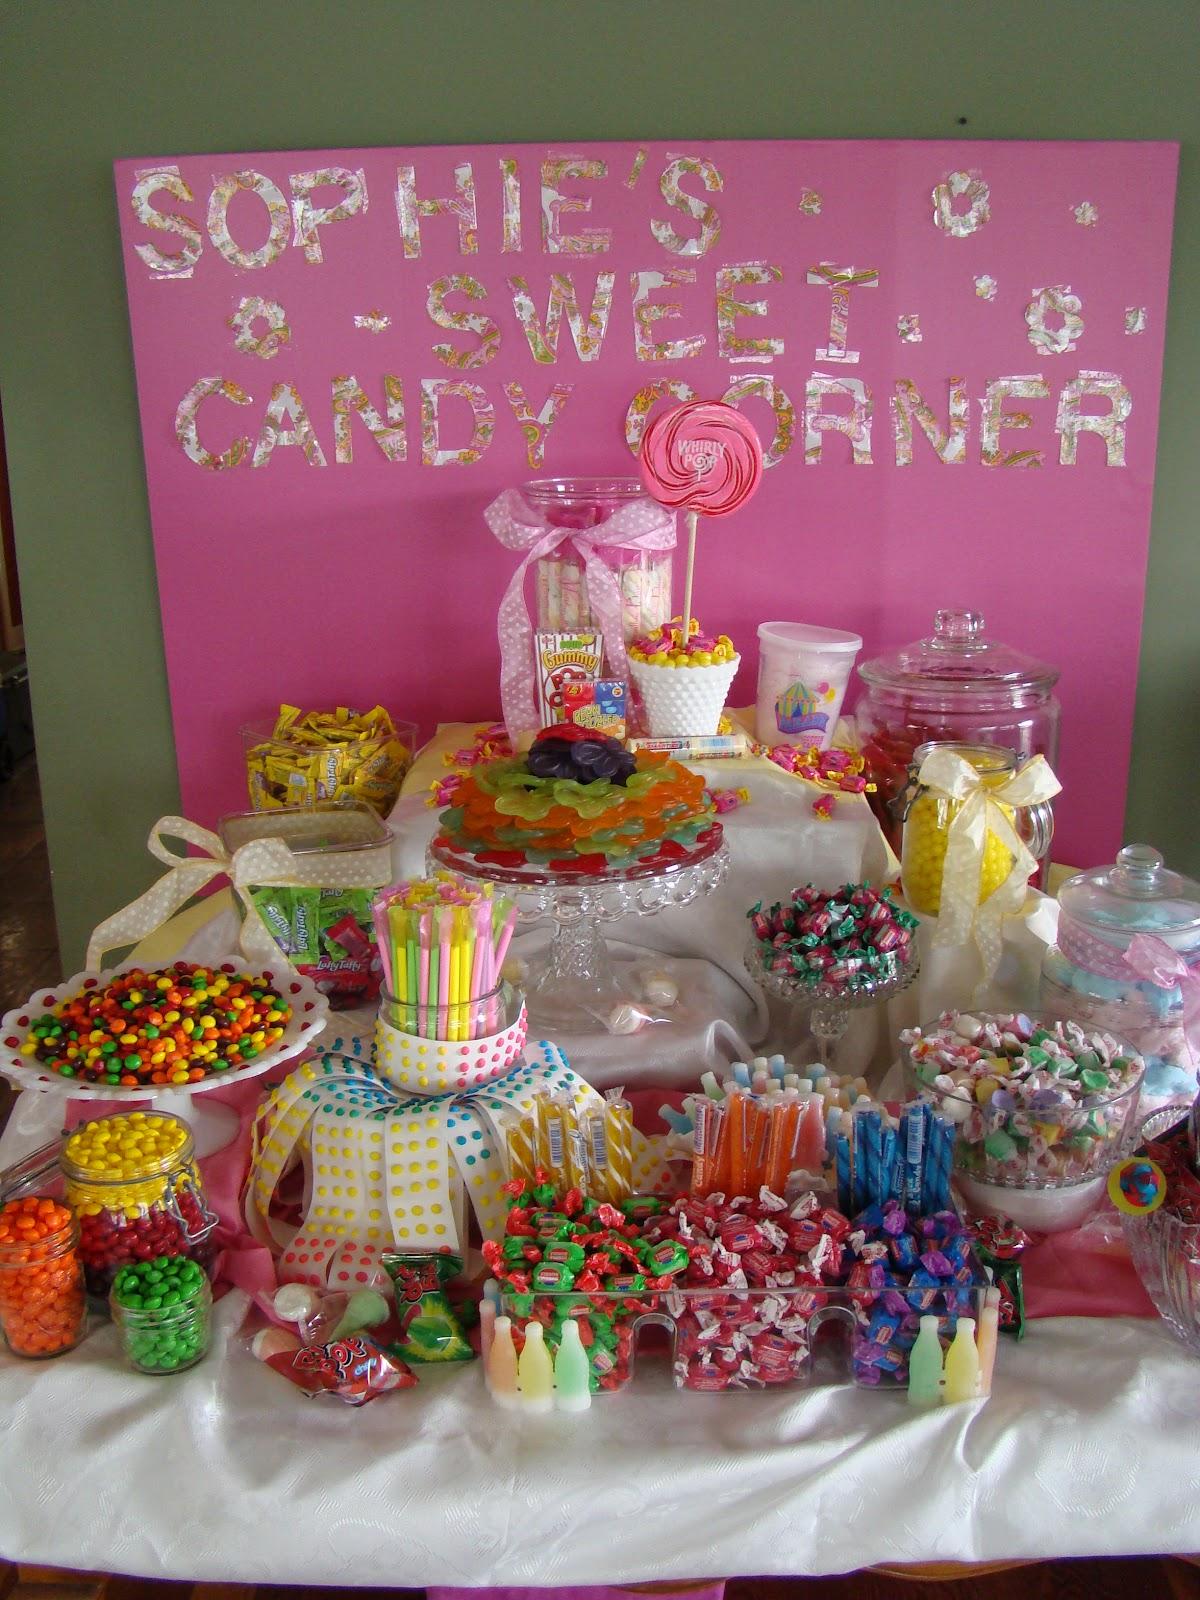 Candy S Colorado Cranker Blog Csm Tools For Cranking: AnnOnandOn: Candy Corner